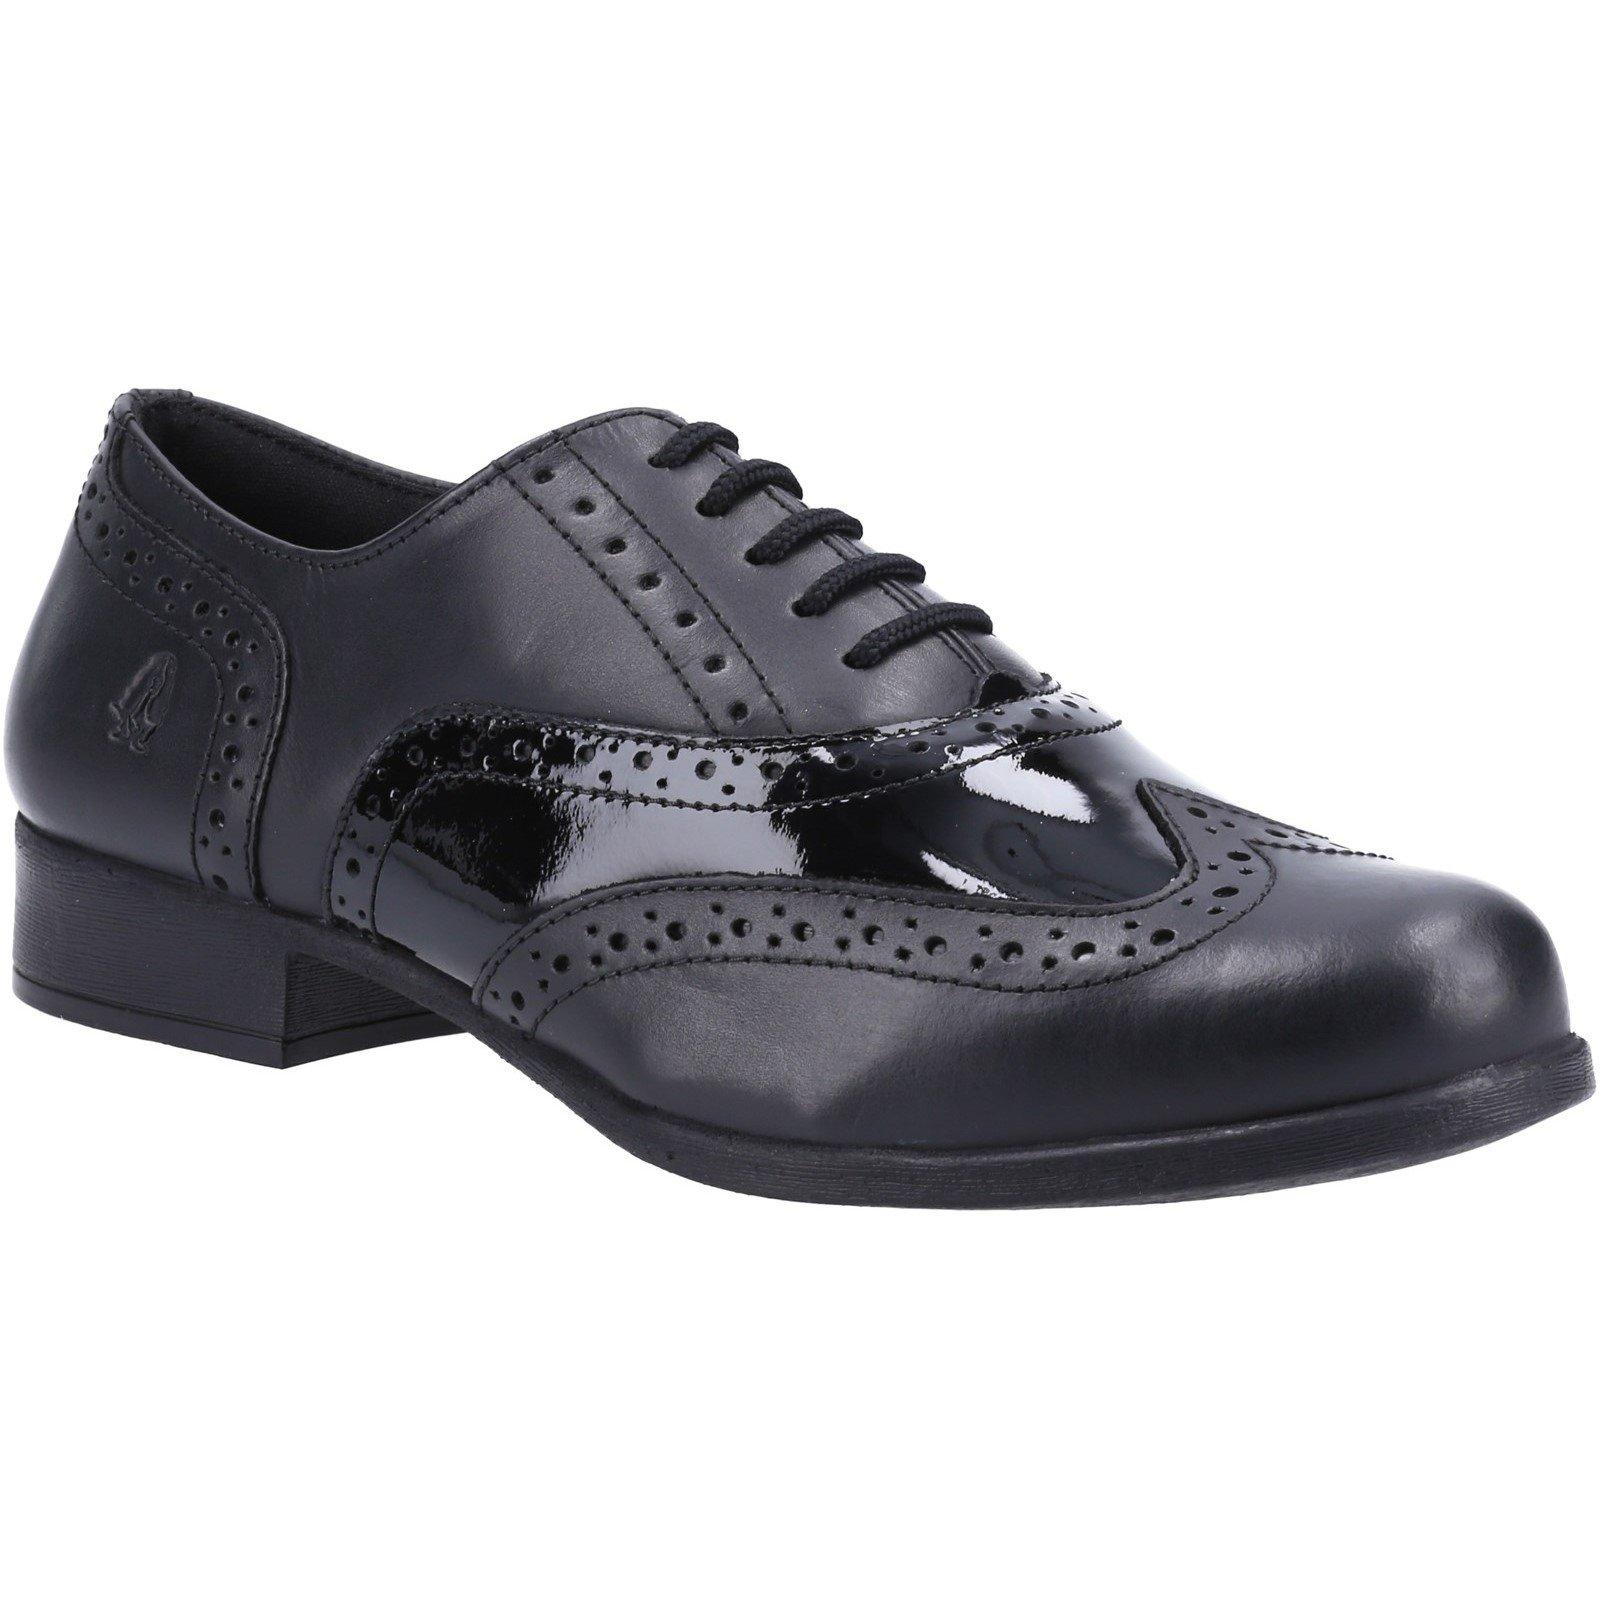 Hush Puppies Kid's Kada Junior School Brogue Shoe Black 33192 - Black 5